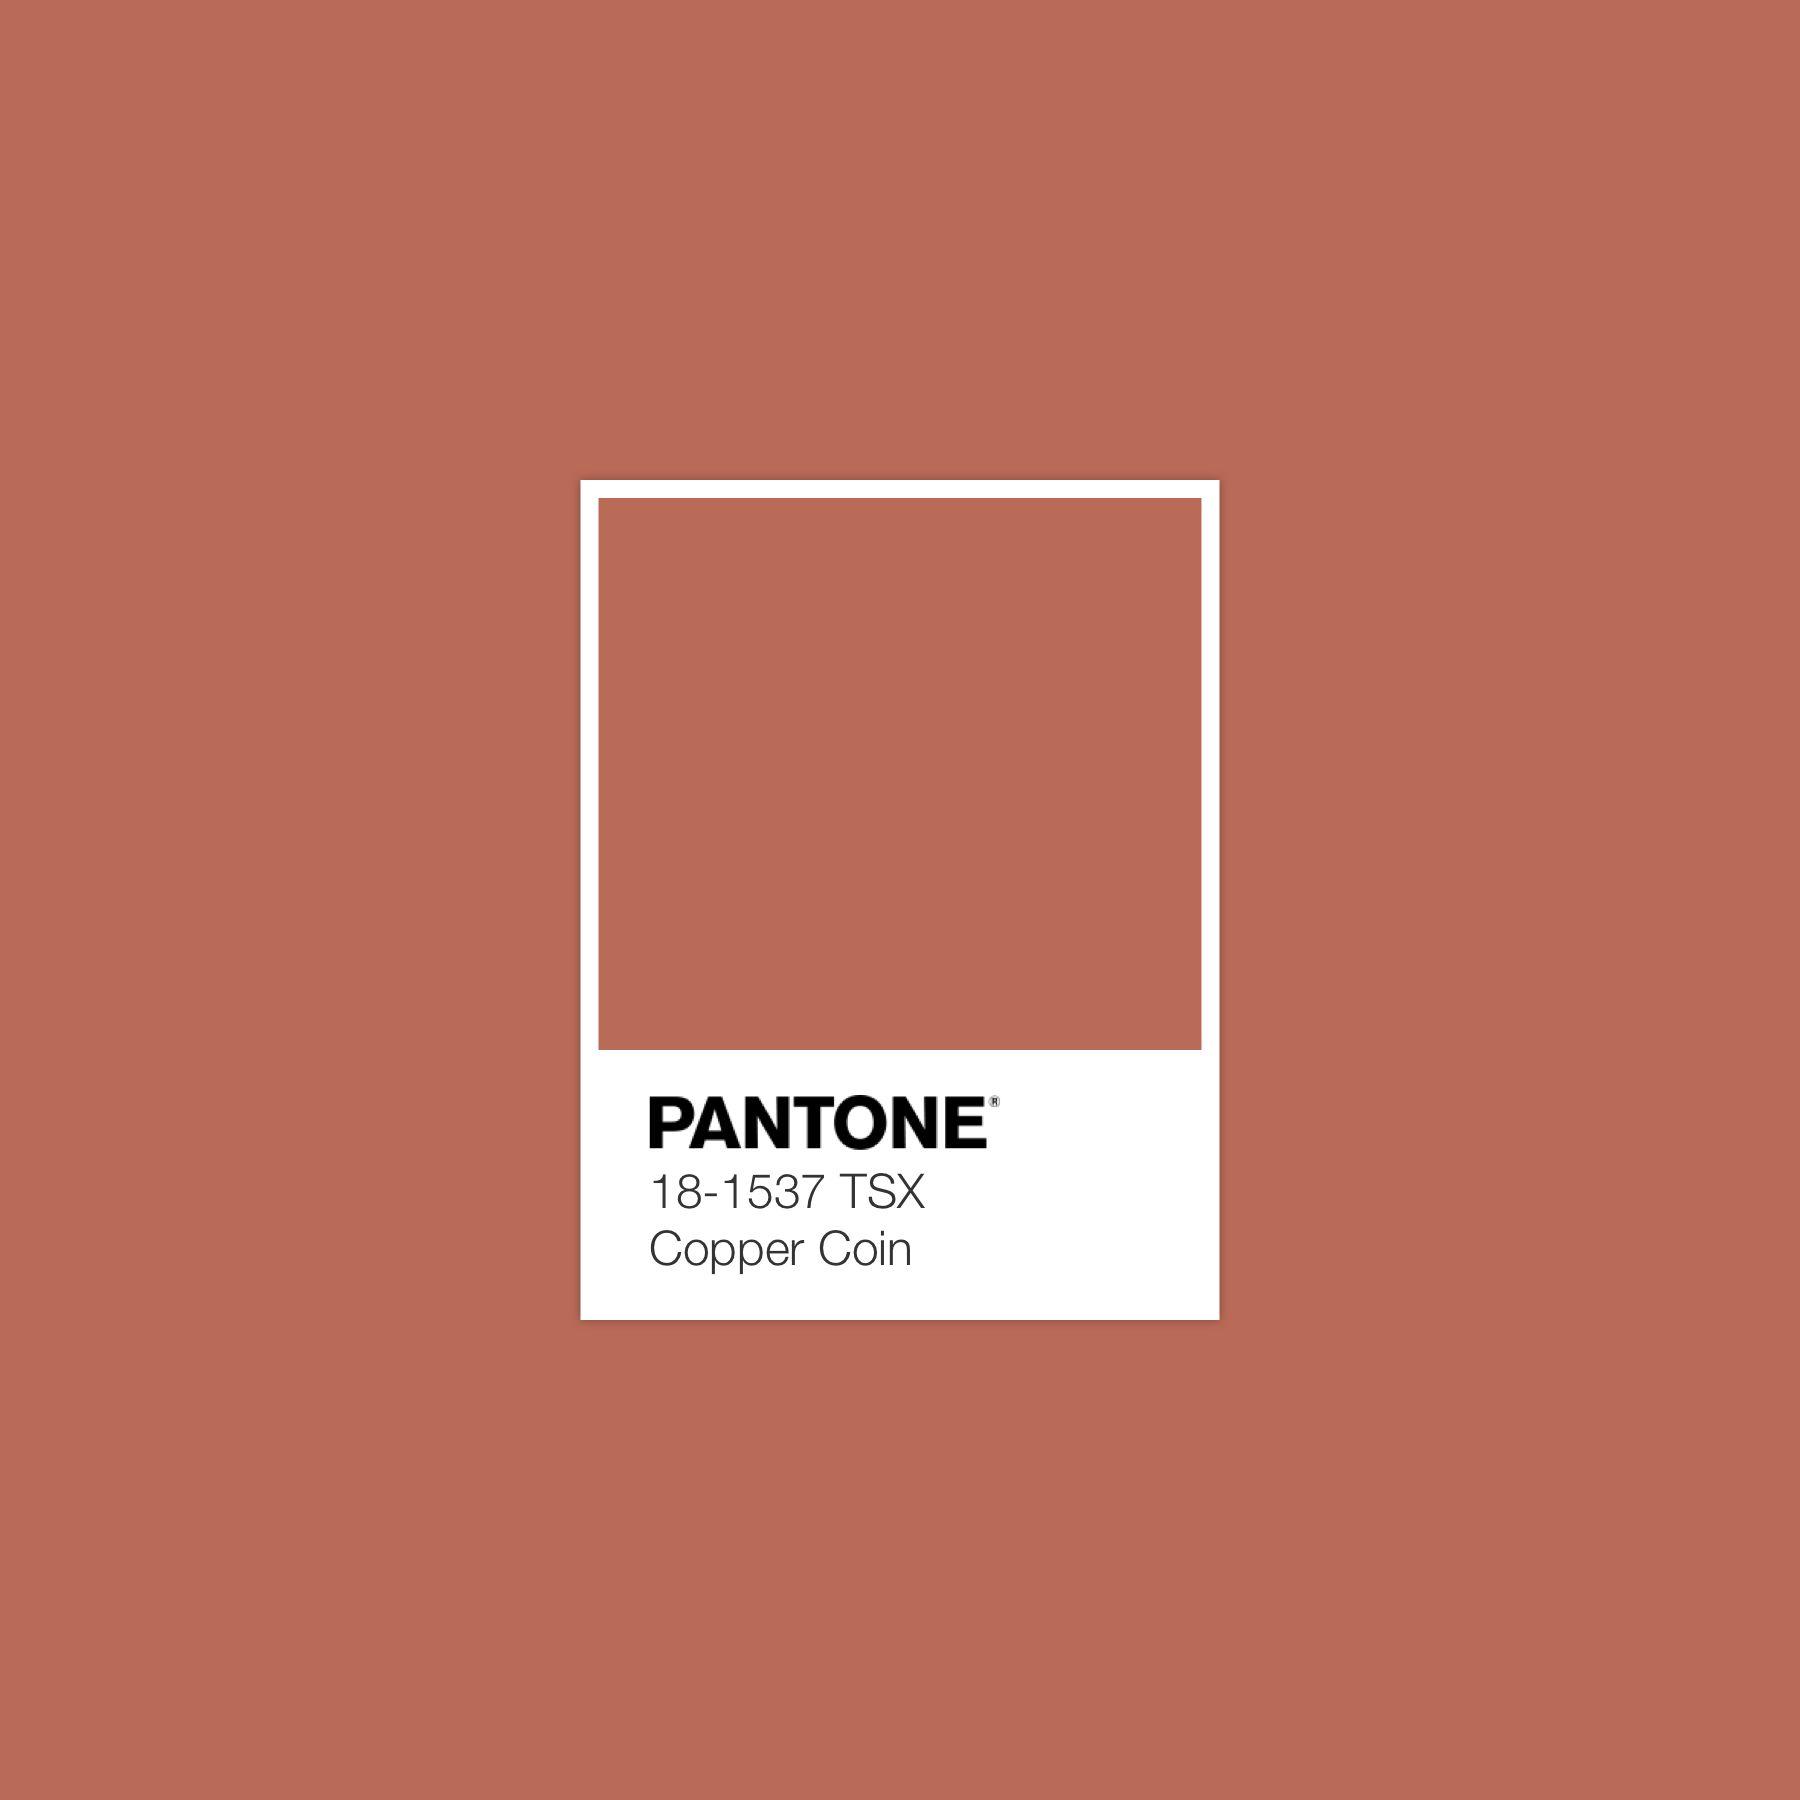 Coppercoin Pantone Luxurydotcom In 2020 Pantone Pantone Color Color Design Inspiration